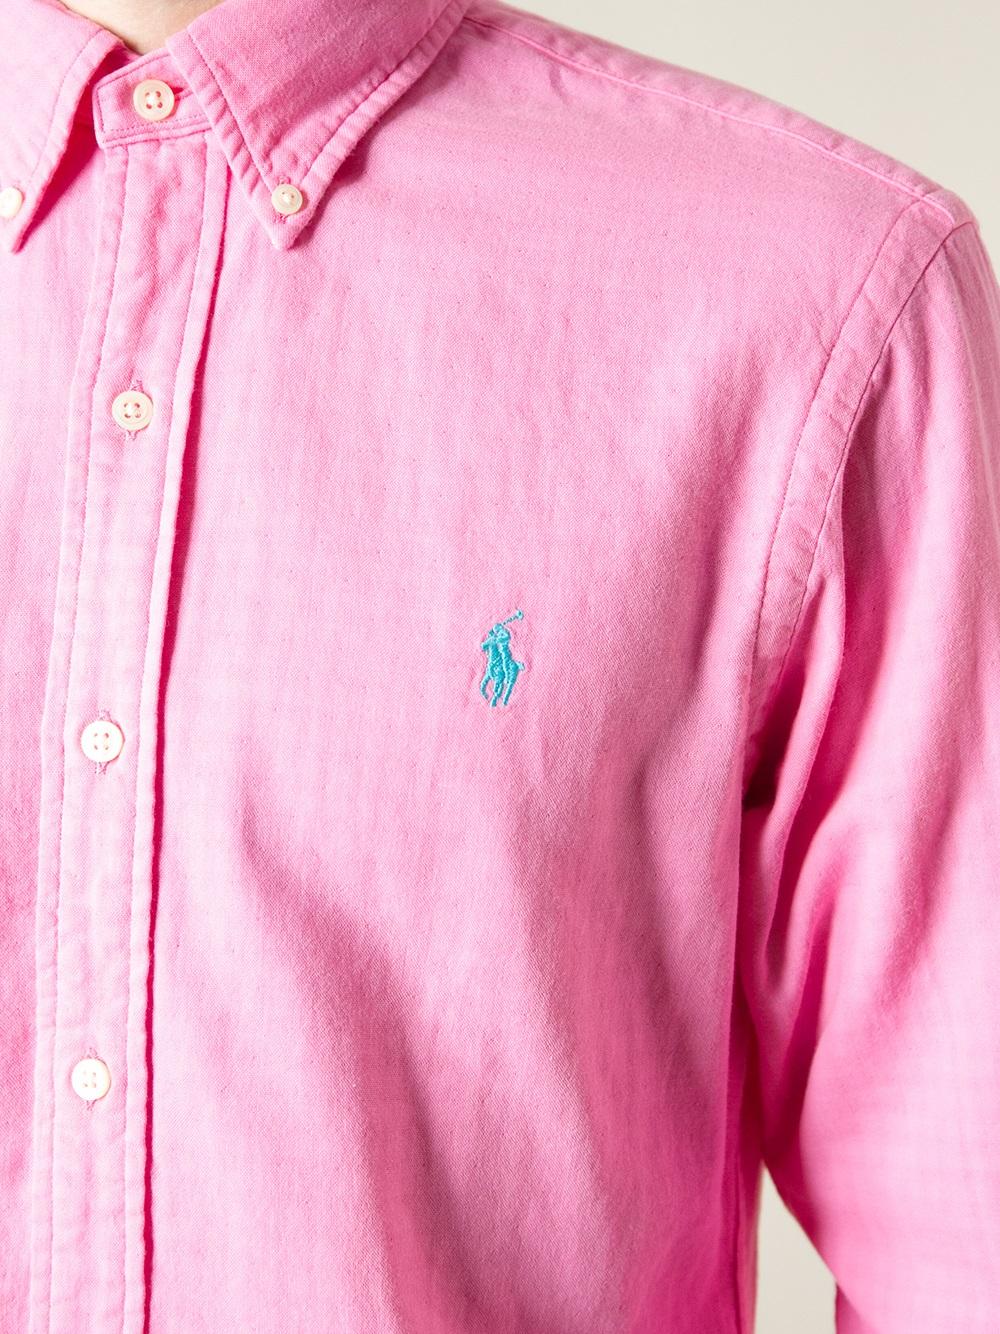 Polo ralph lauren Button Down Shirt in Pink for Men | Lyst